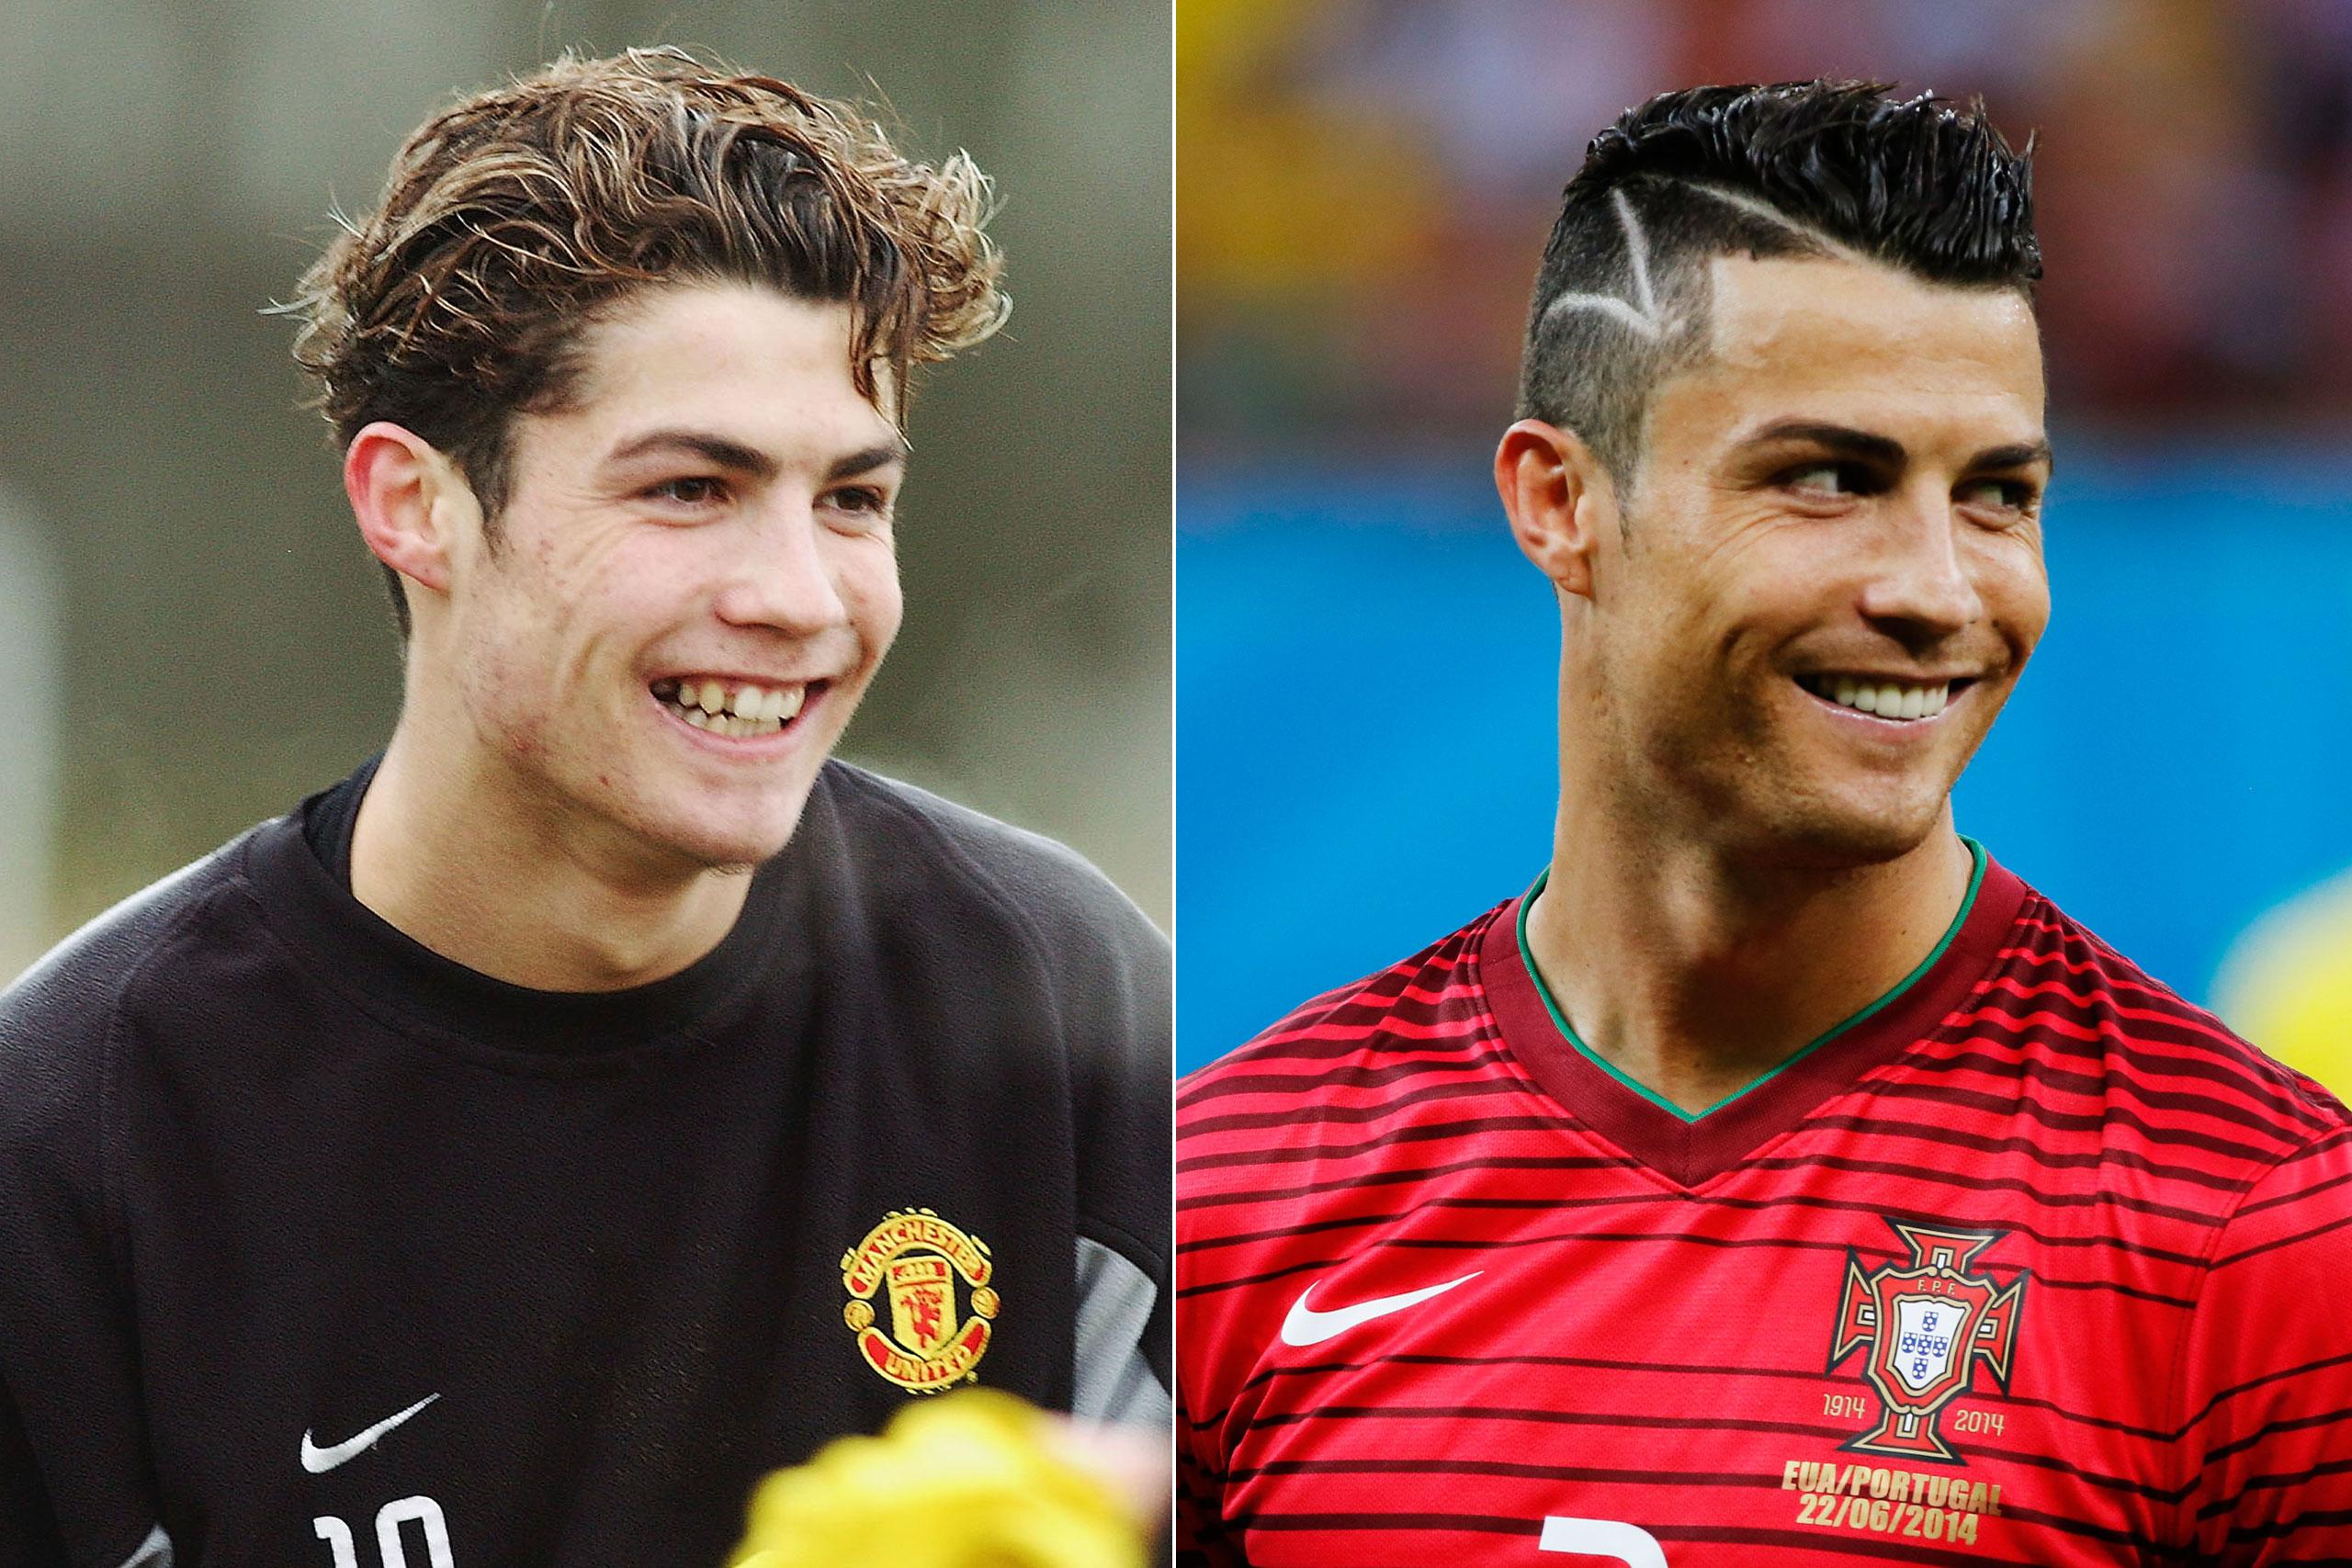 Left: Cristiano Ronaldo in 2004; Right: Cristiano Ronaldo playing for Portugal at the FIFA World Cup in Brazil, 2014.